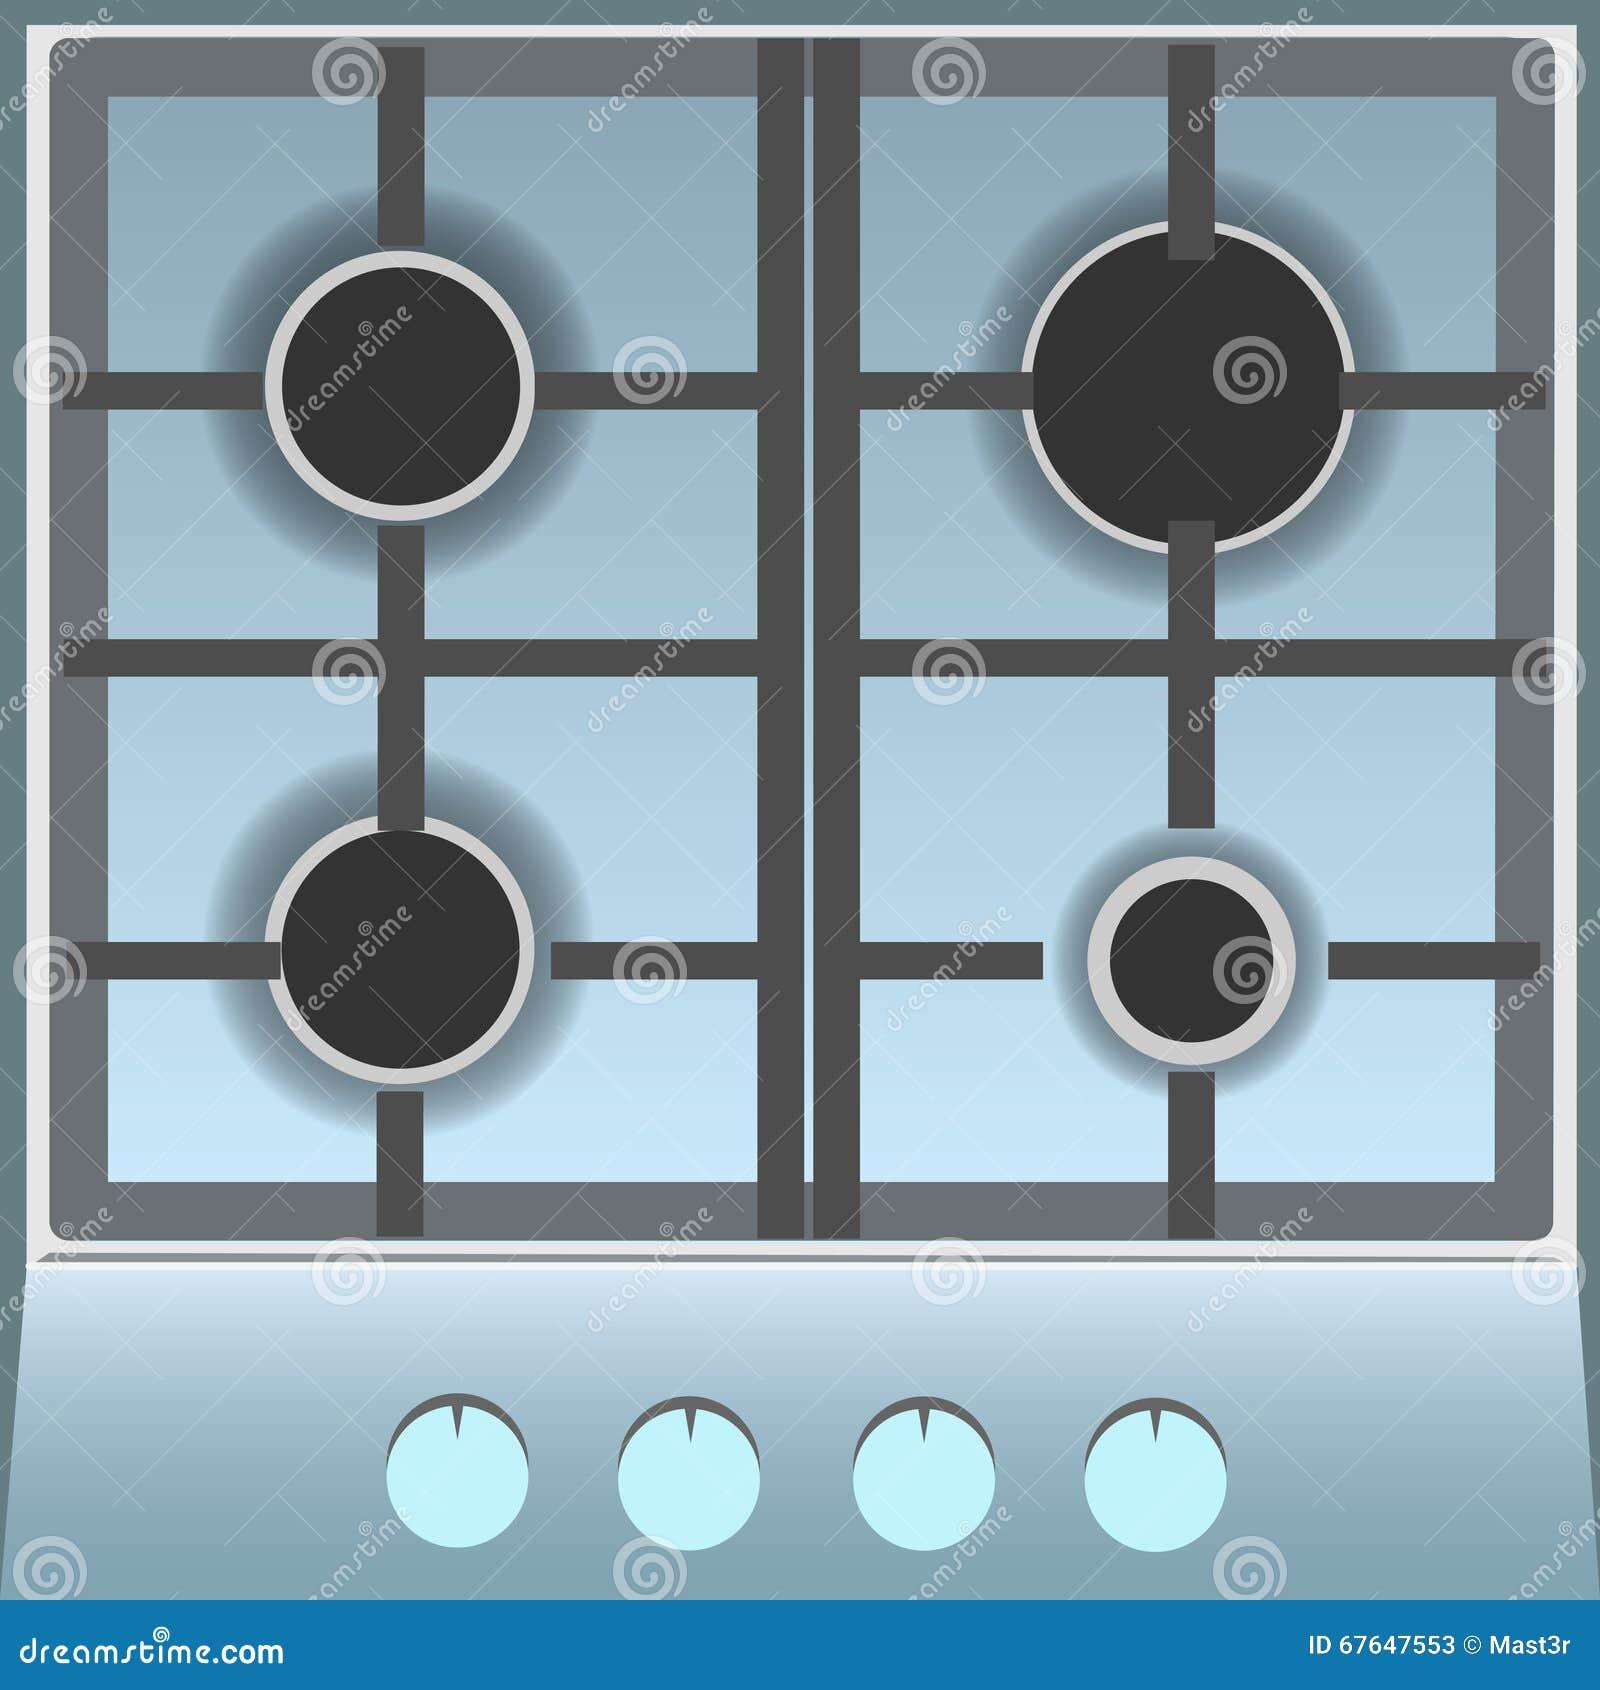 Kitchen gas stove top view - Empty Gas Stove Top View Stock Photos